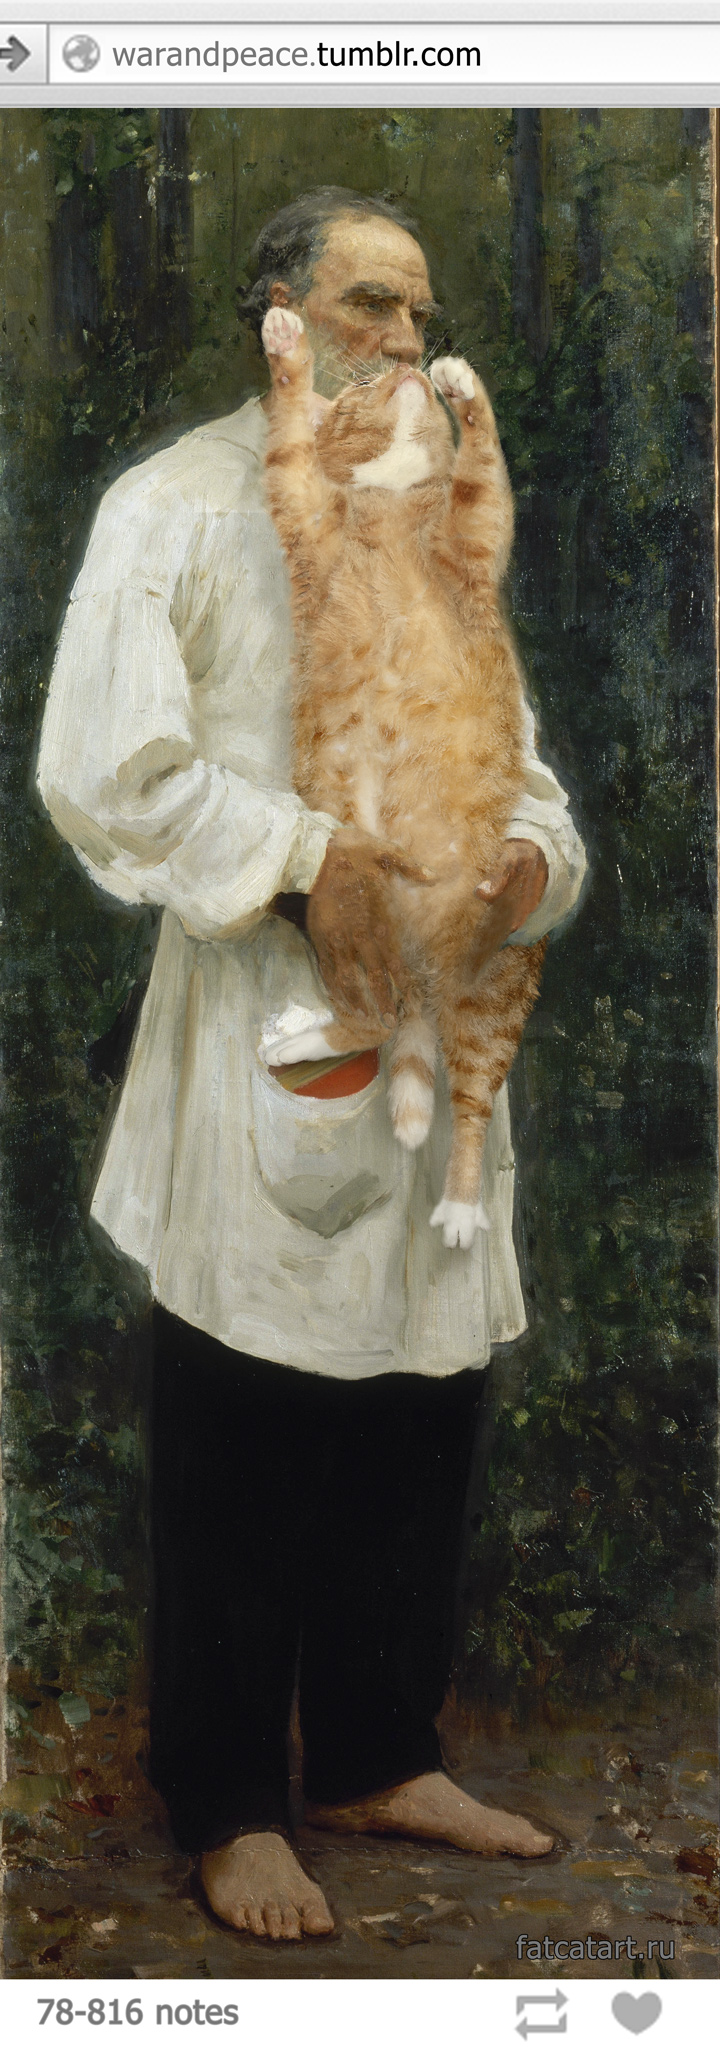 Ilya Repin, Leo Tolstoy with the cat beard, barefoot.